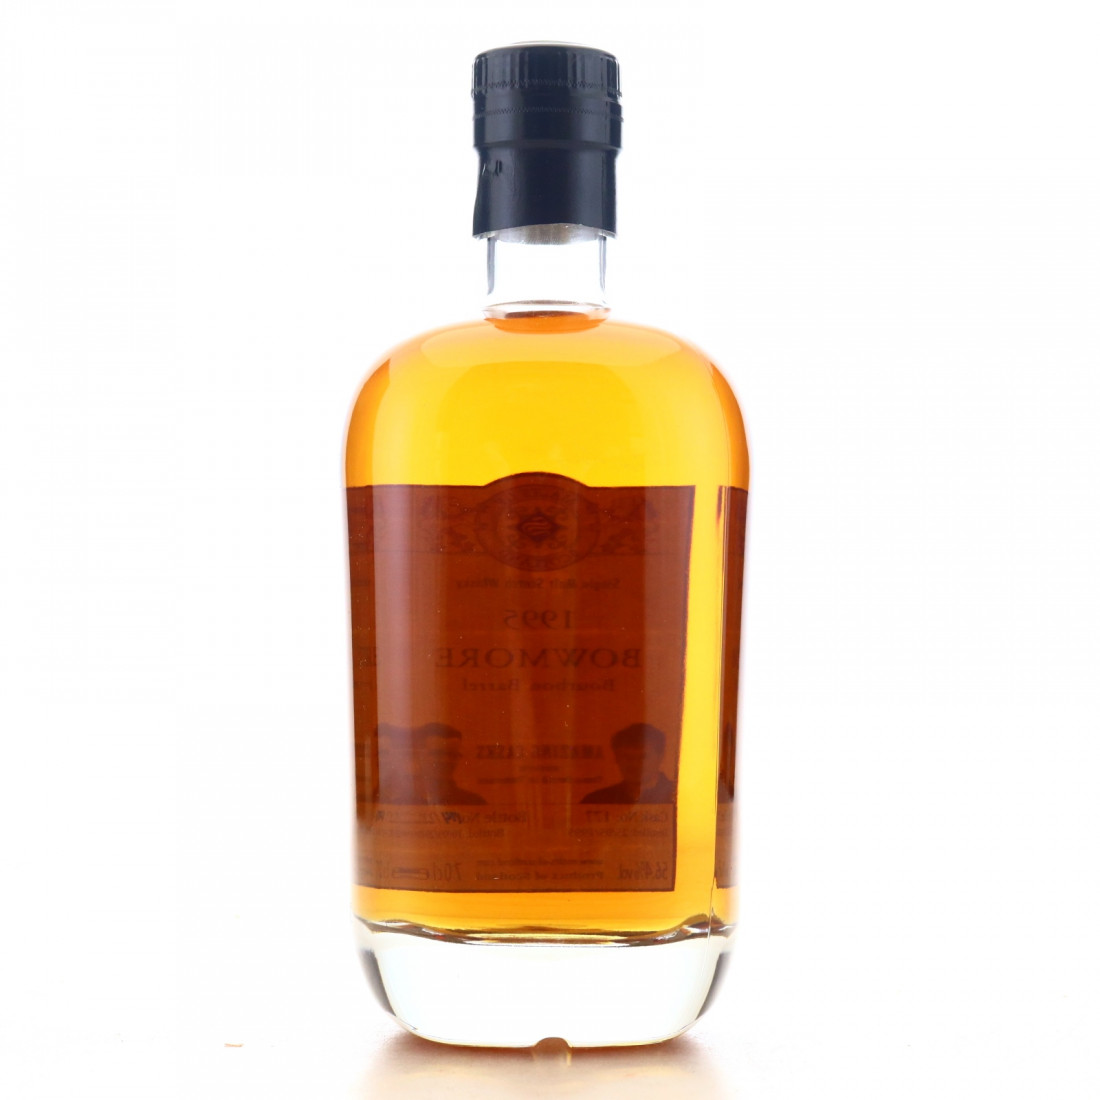 Bowmore 1995 Malts of Scotland Bourbon Barrel / Amazing Casks